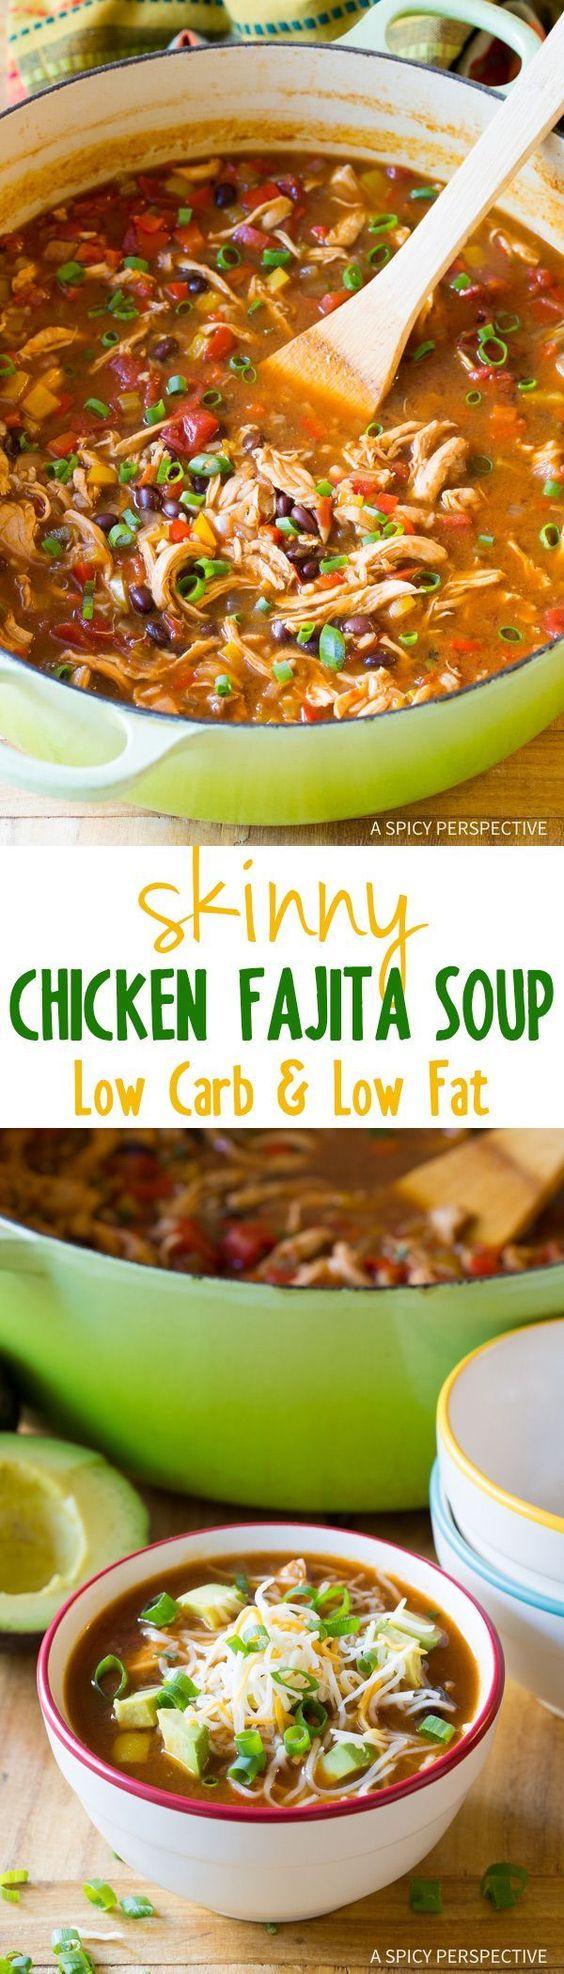 Amazing Skinny Chicken Fajita Soup Recipe - Low Fat, Gluten Free, & Low Carb Option!